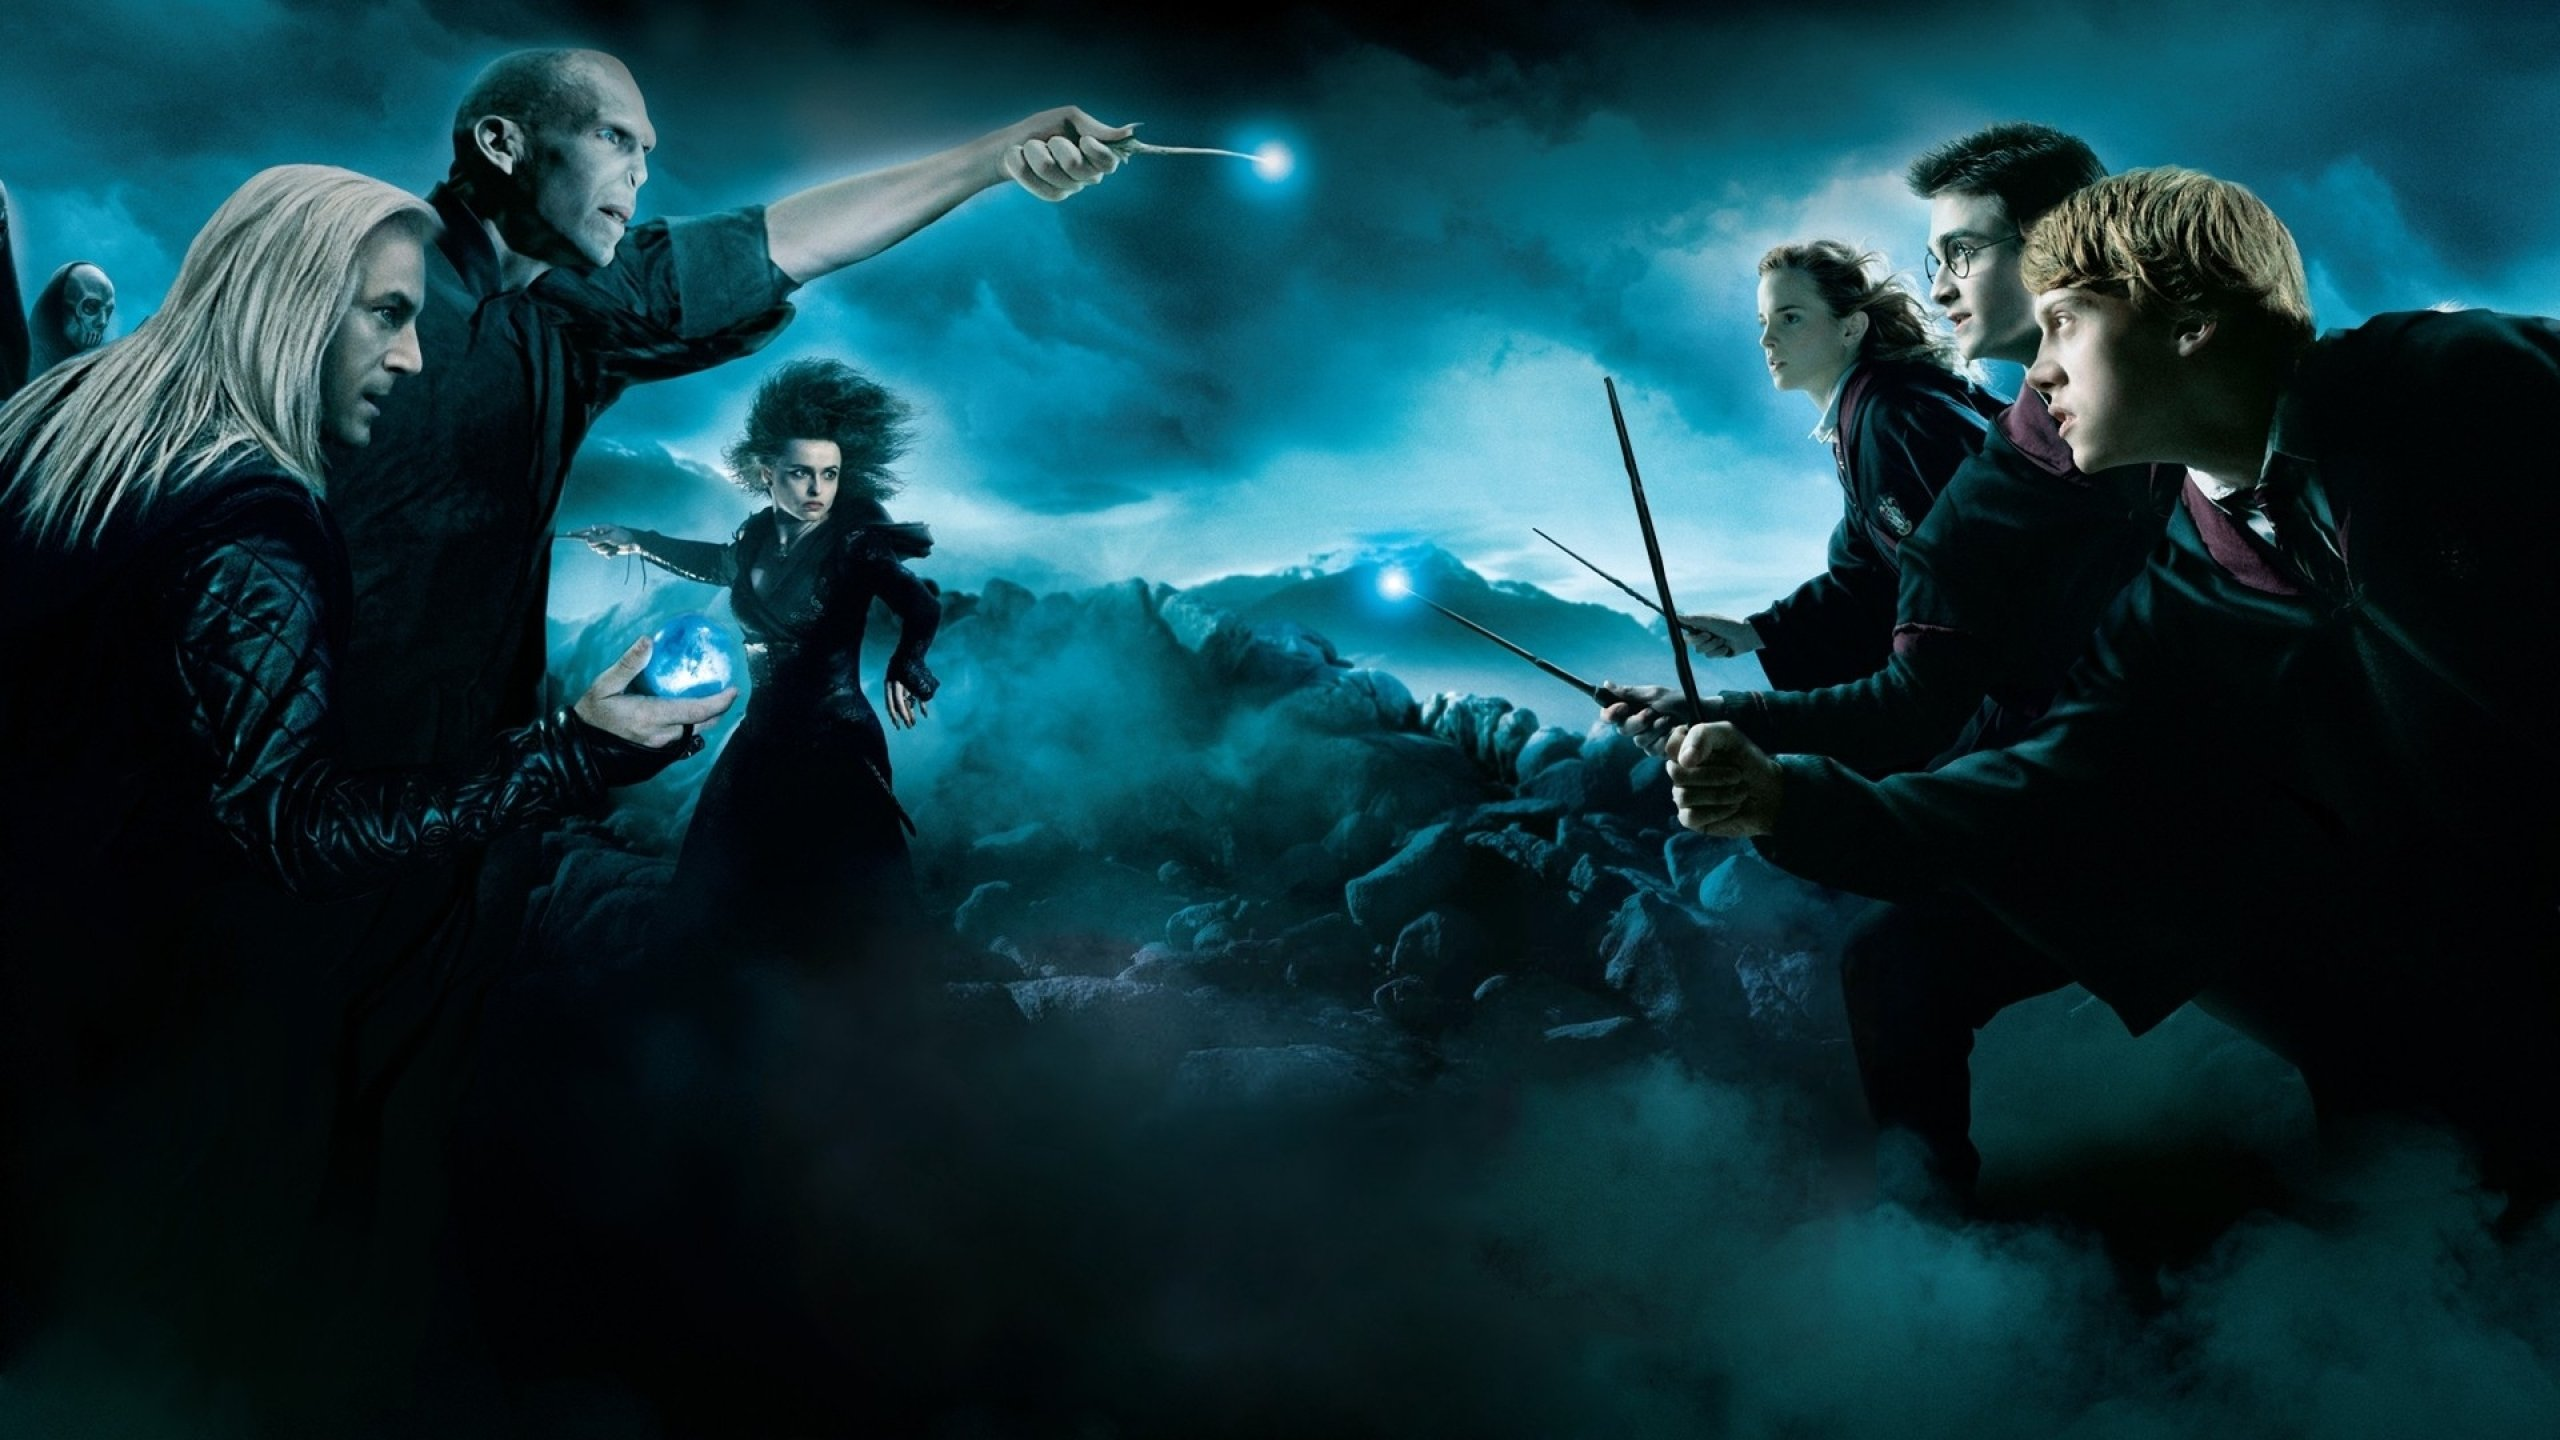 Harry-Potter-Zauberstaebe-Online-Shop-mit-Fanartikel-Merchandise